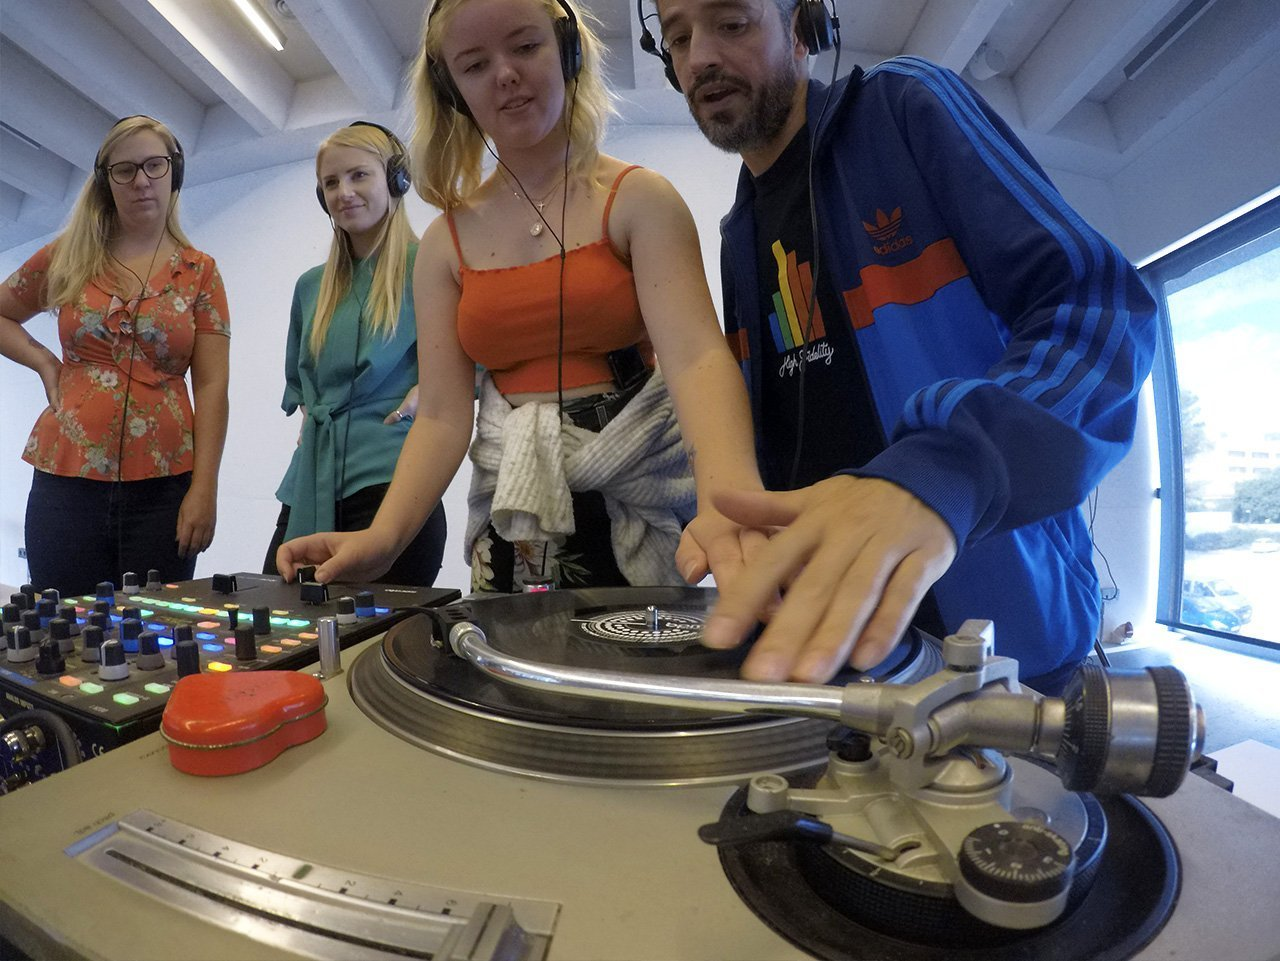 DJ workshop building activity